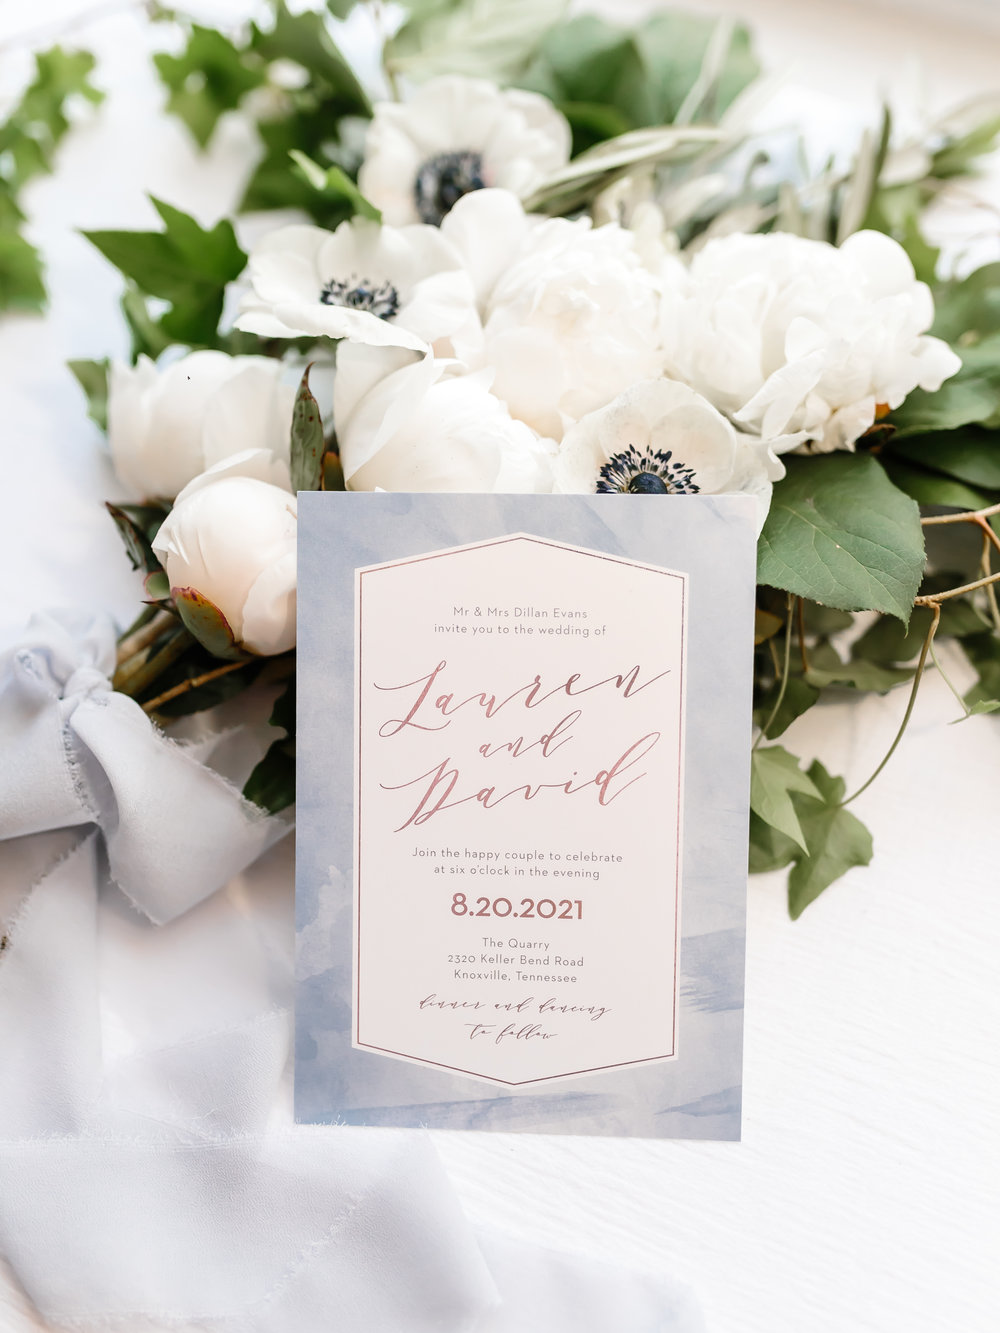 blue watercolor custom wedding invitation suite stationery white anemones white peonies white bouquet ivy lemon leaf